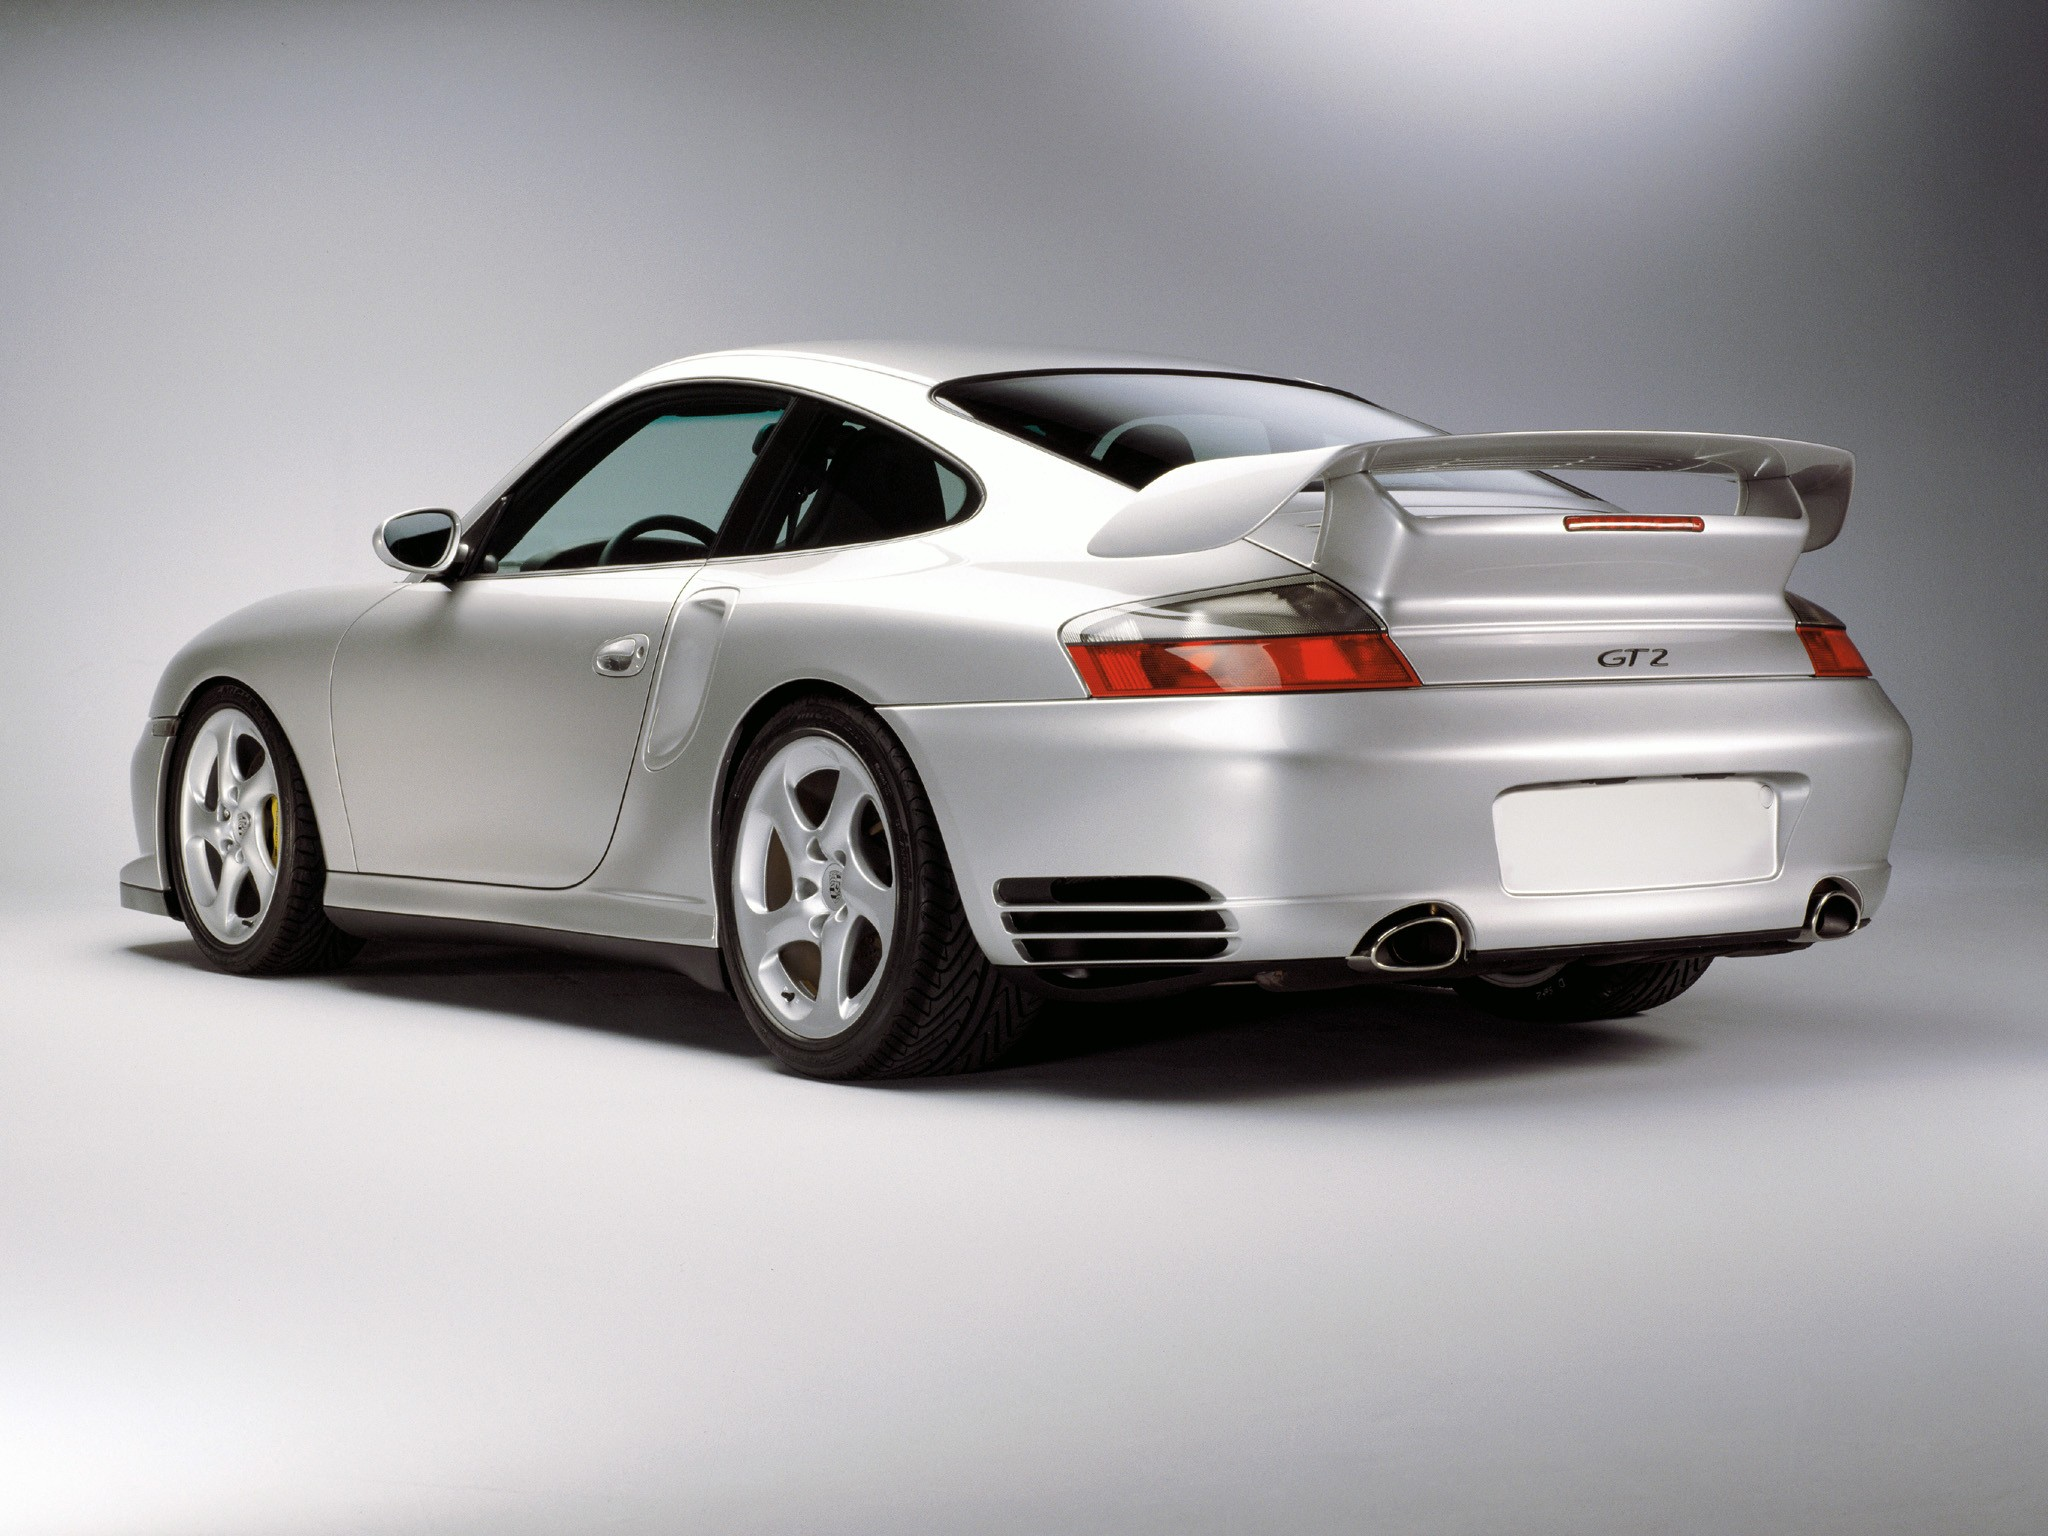 porsche 911 gt2 996 specs photos 2001 2002 2003 2004 2005 2006 autoevolution. Black Bedroom Furniture Sets. Home Design Ideas